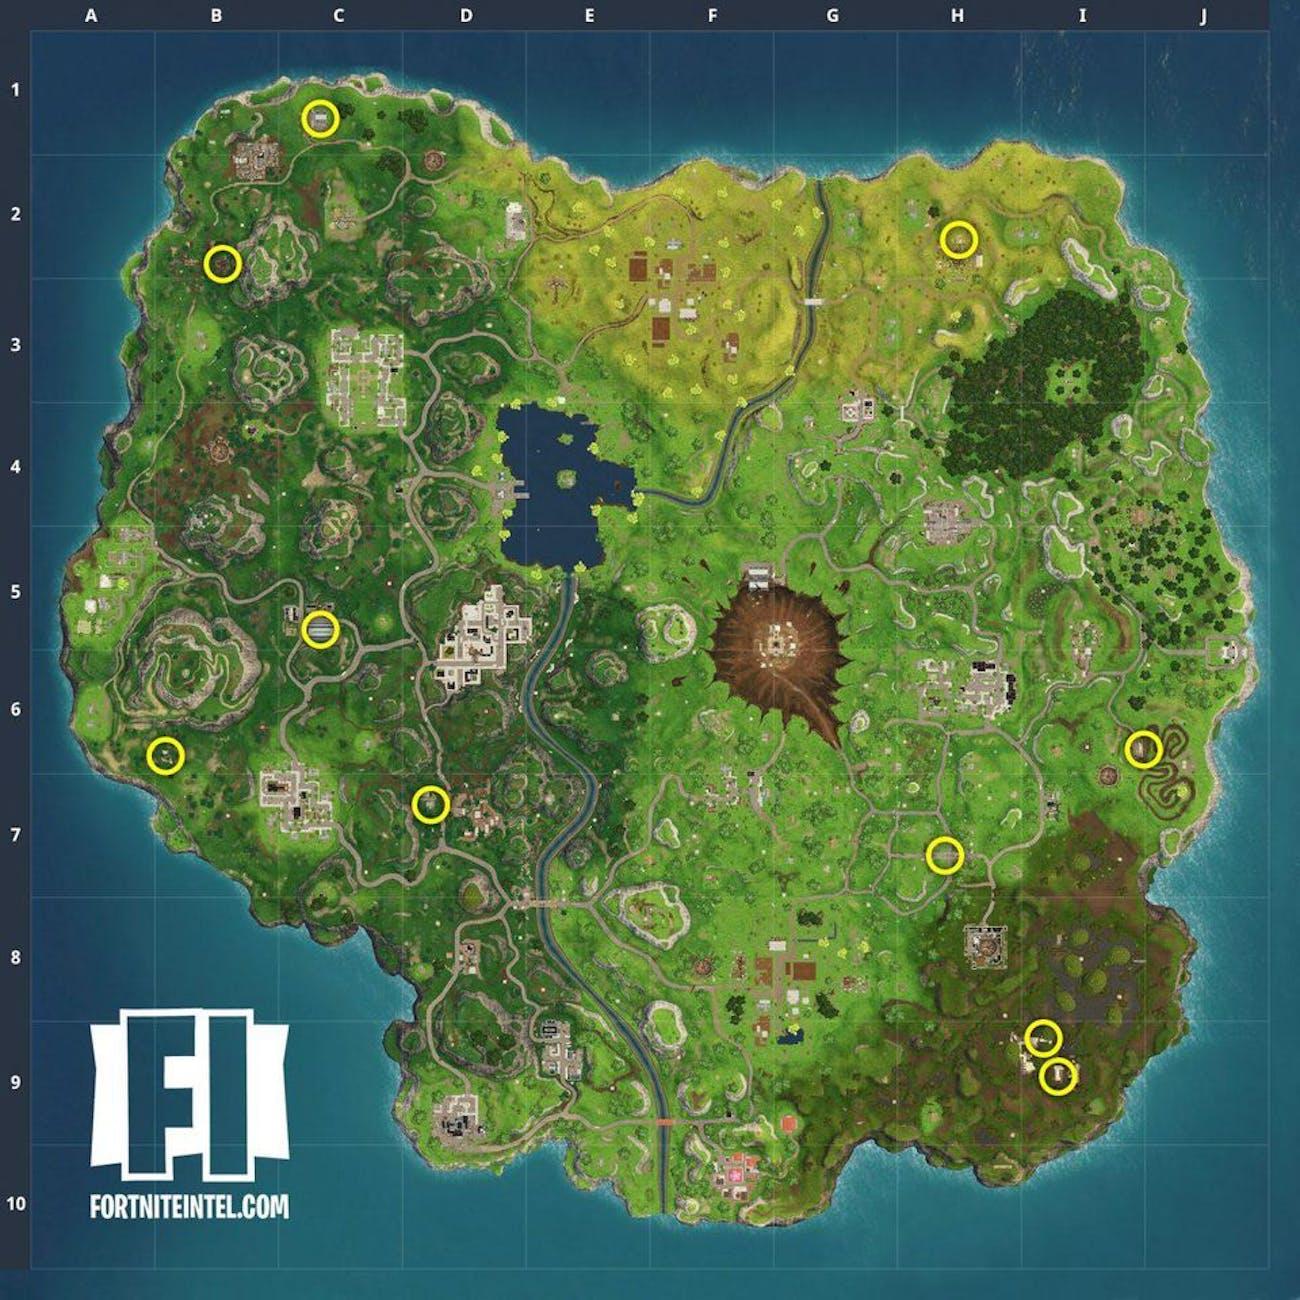 fortnite map season 7